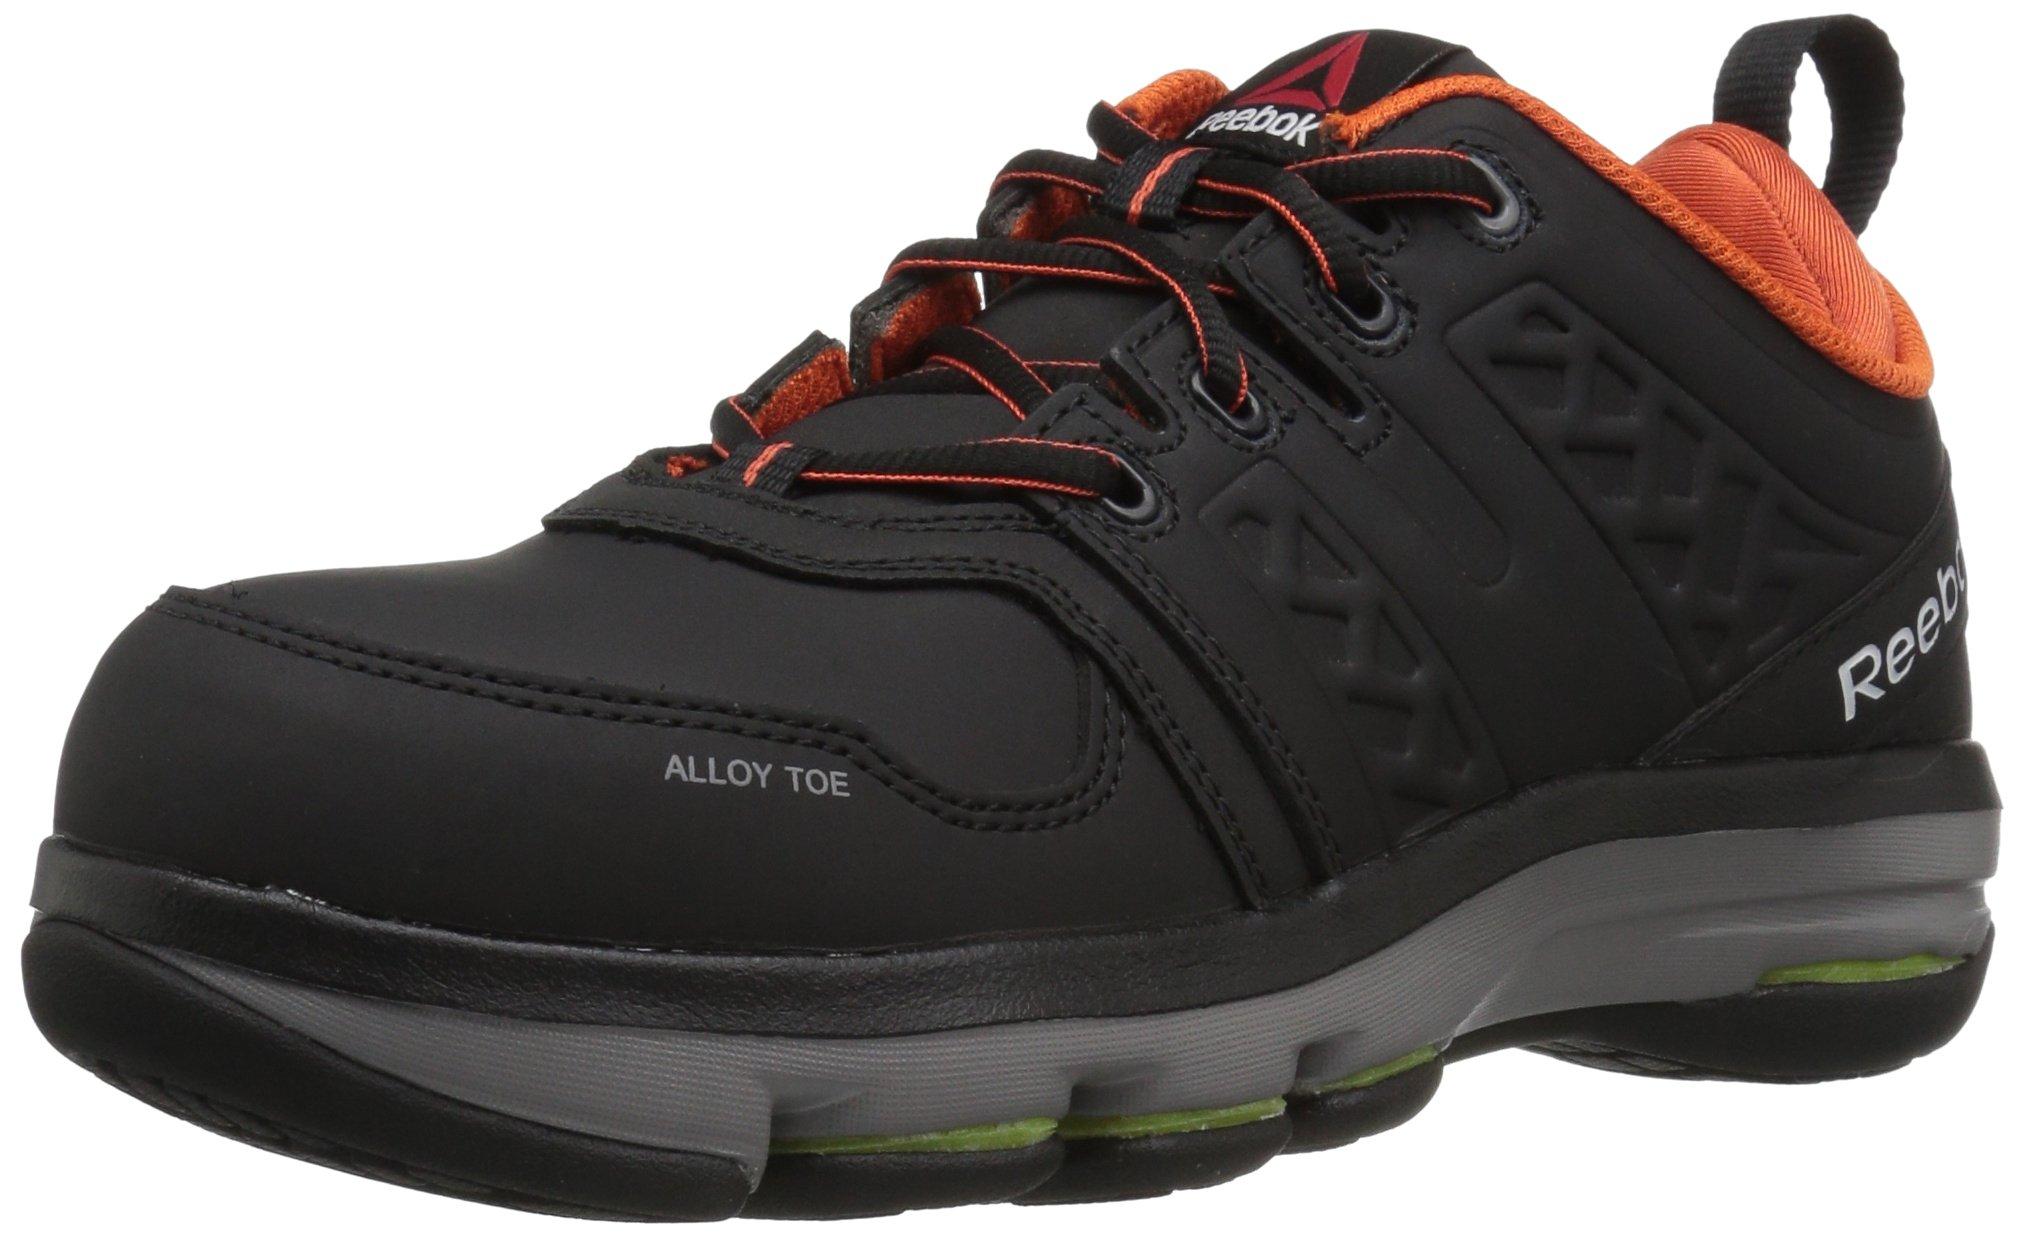 Reebok Work Men's Dmx Flex Work RB3602 Industrial and Construction Shoe